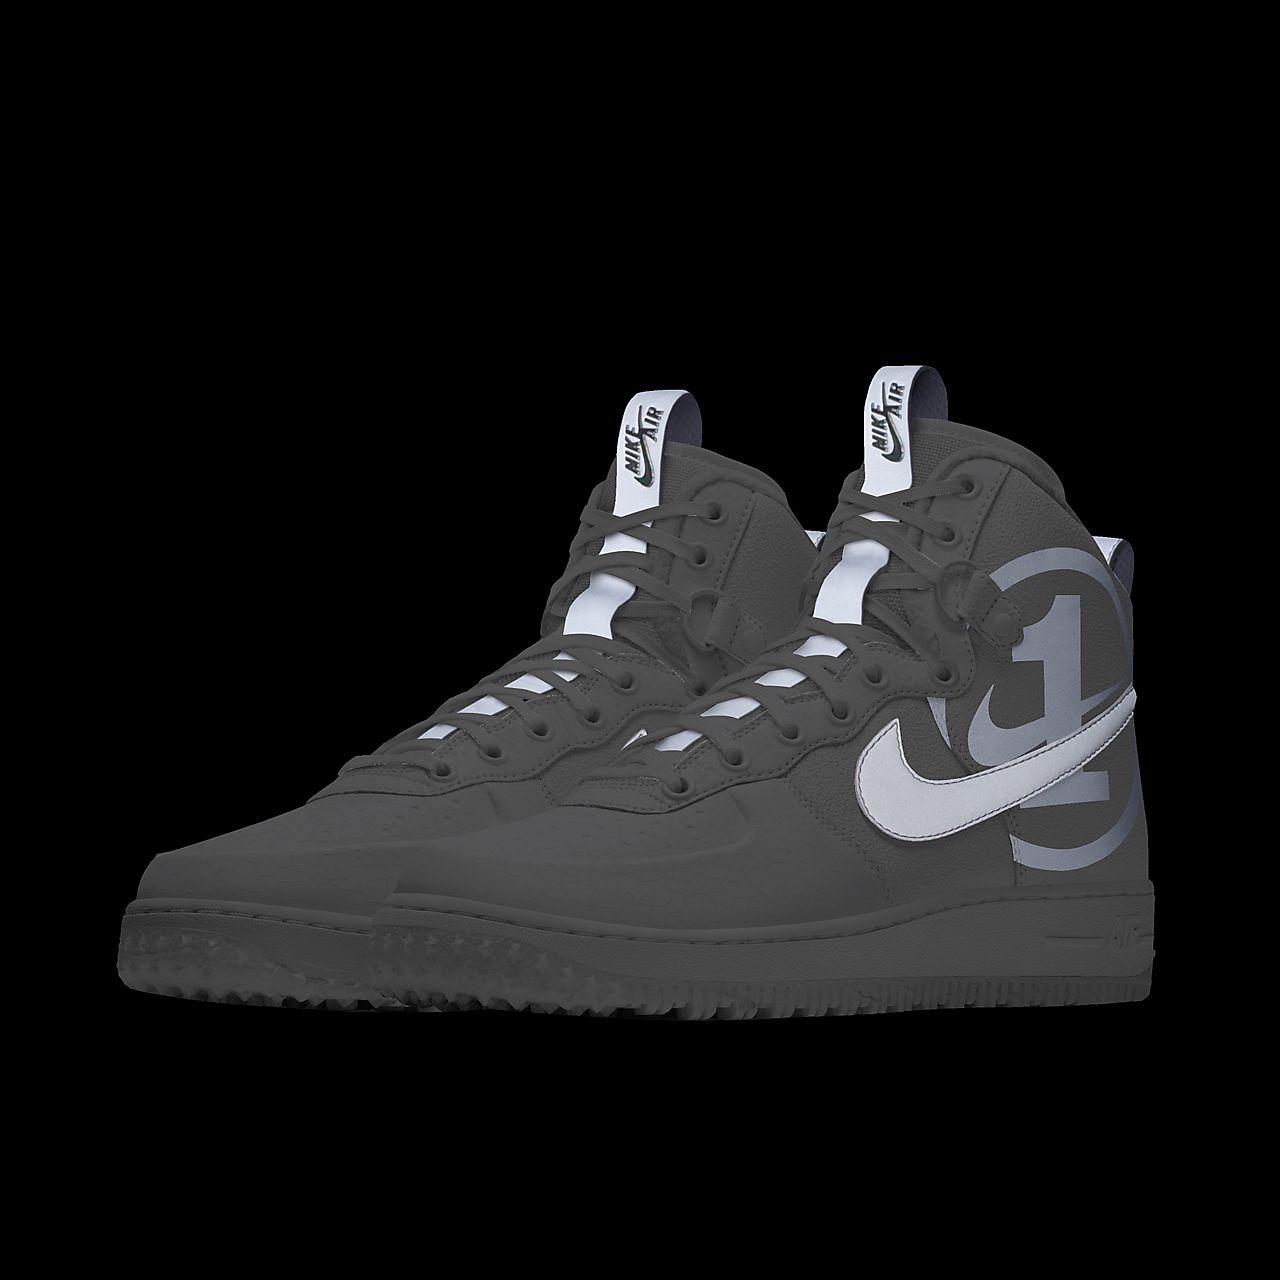 Nike Air Force 1 High iD Schuh für ältere Kinder | clothing